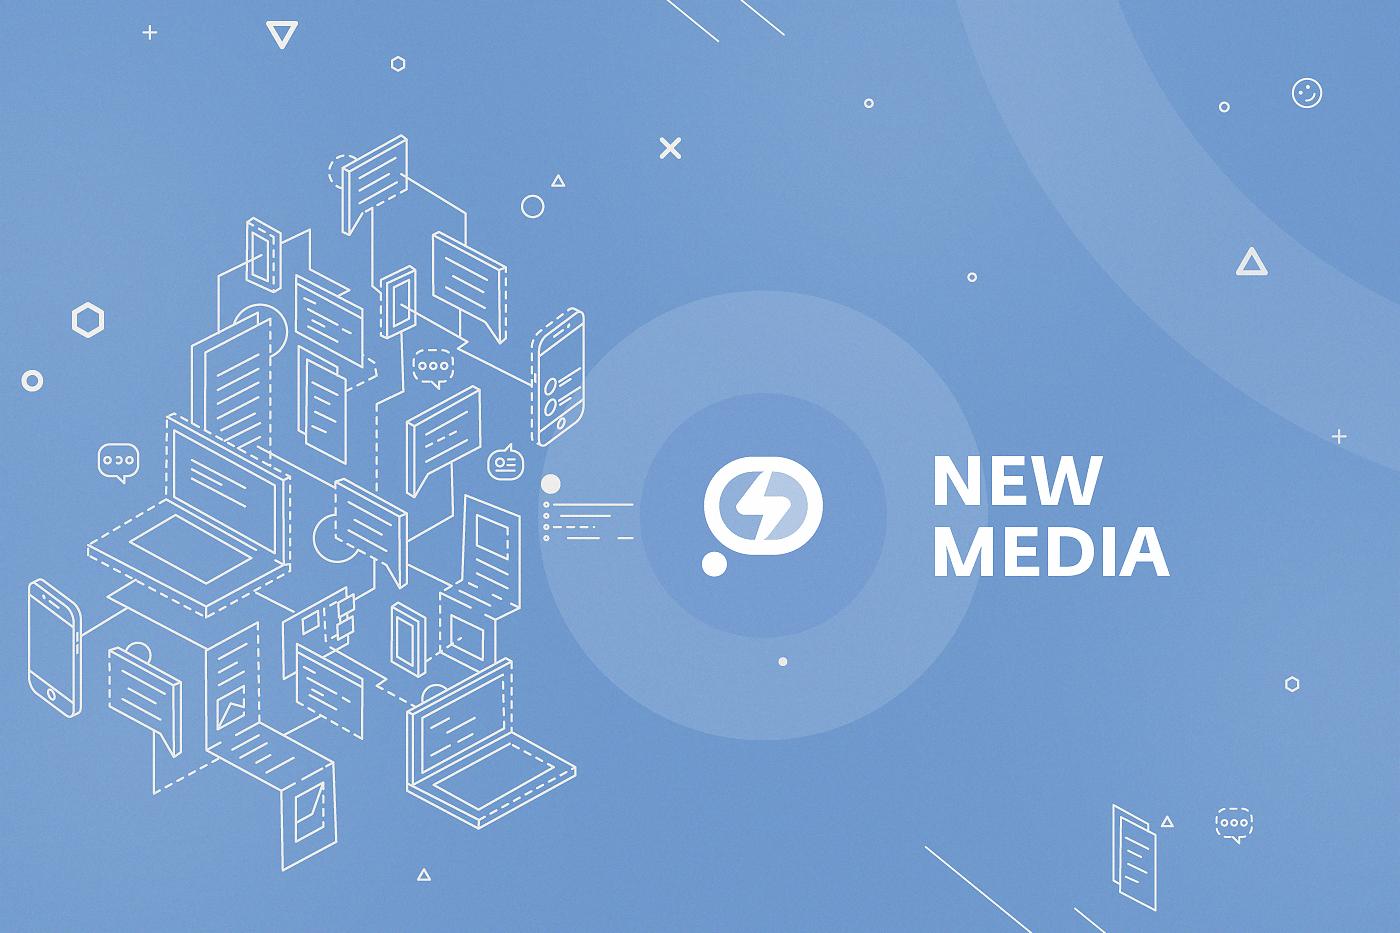 newmedia eng - New media